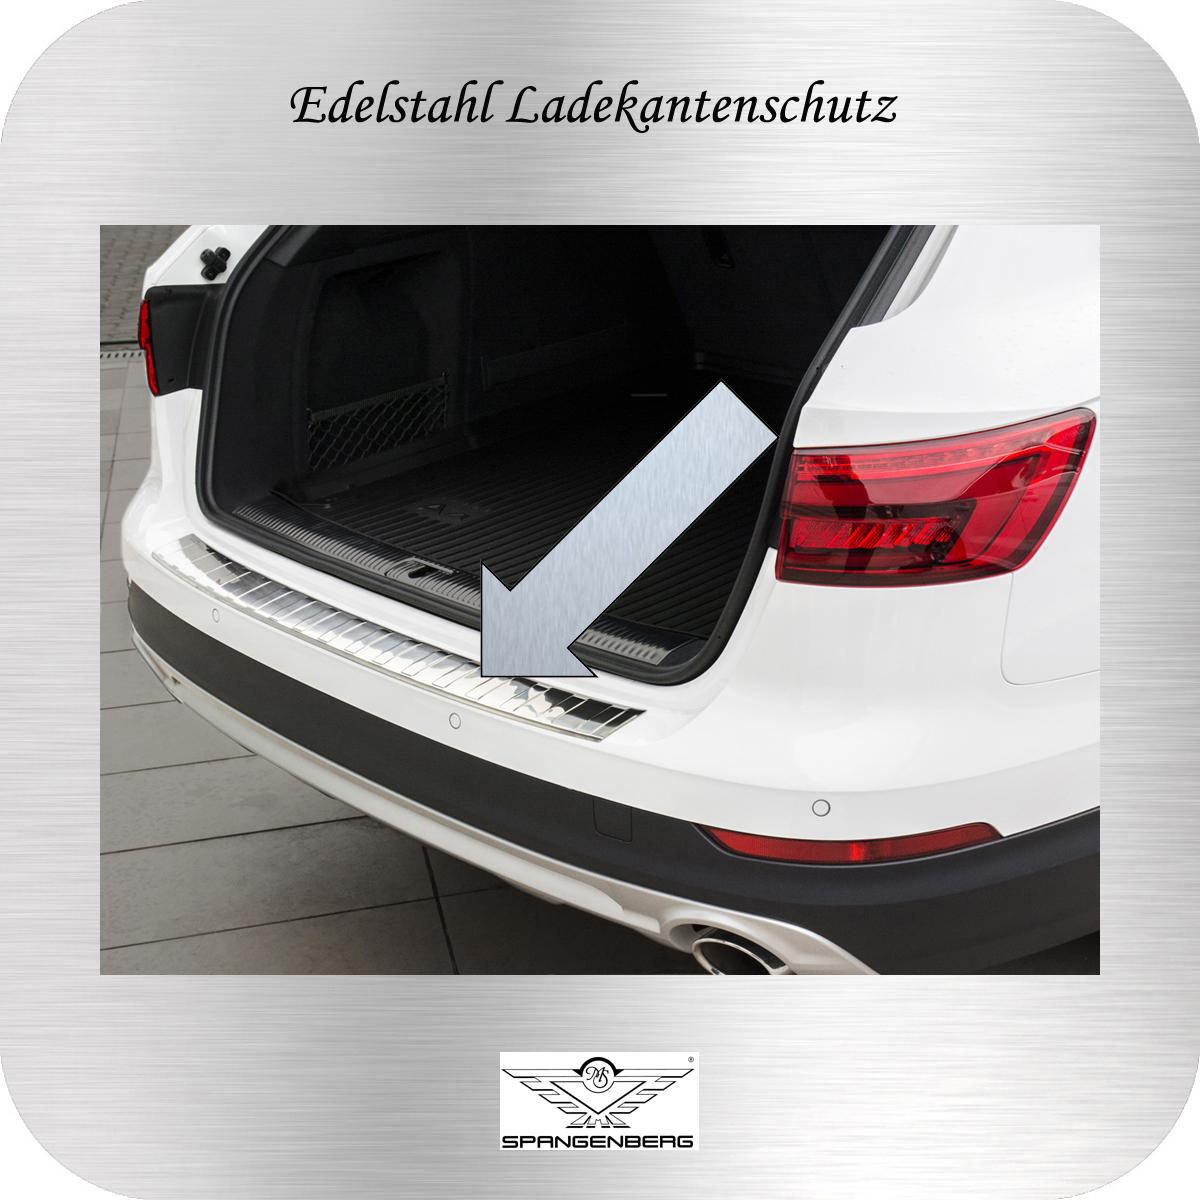 Ladekantenschutz Edelstahl Audi A4 Allroad 8WH B9 Kombi ab 2016- 3235507